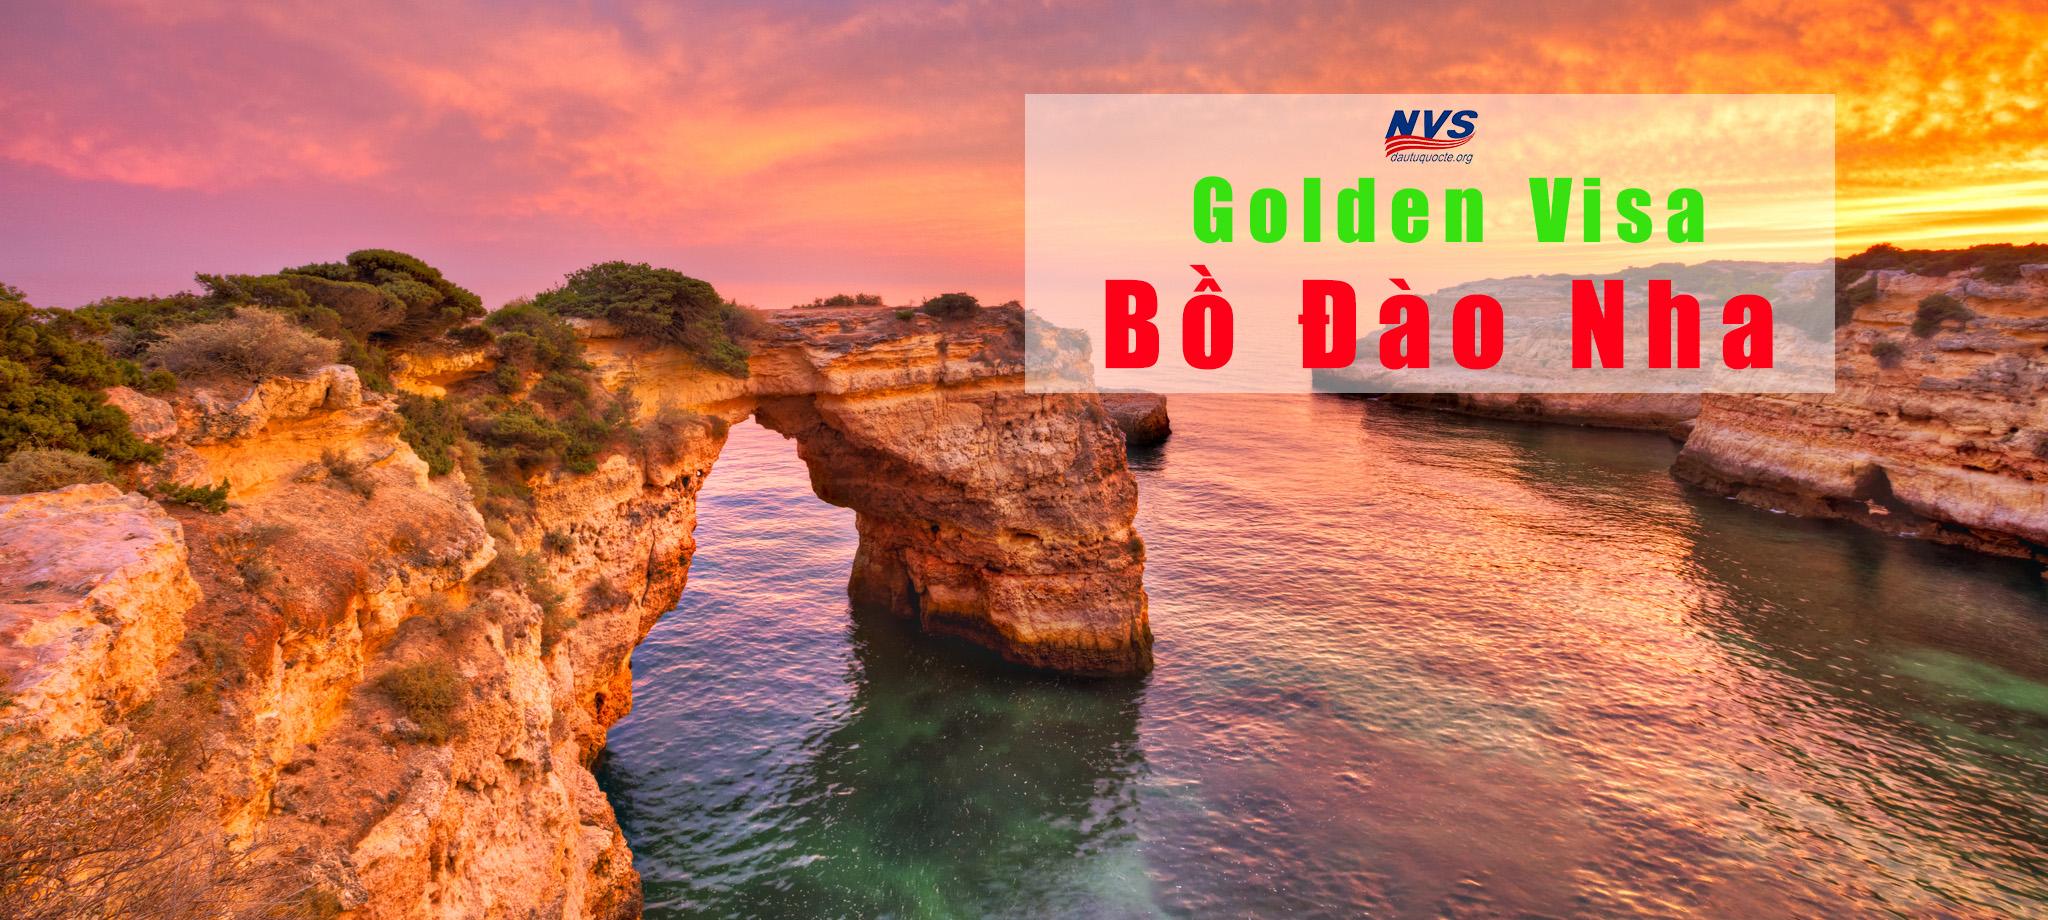 Golden Visa Bồ Đào Nha